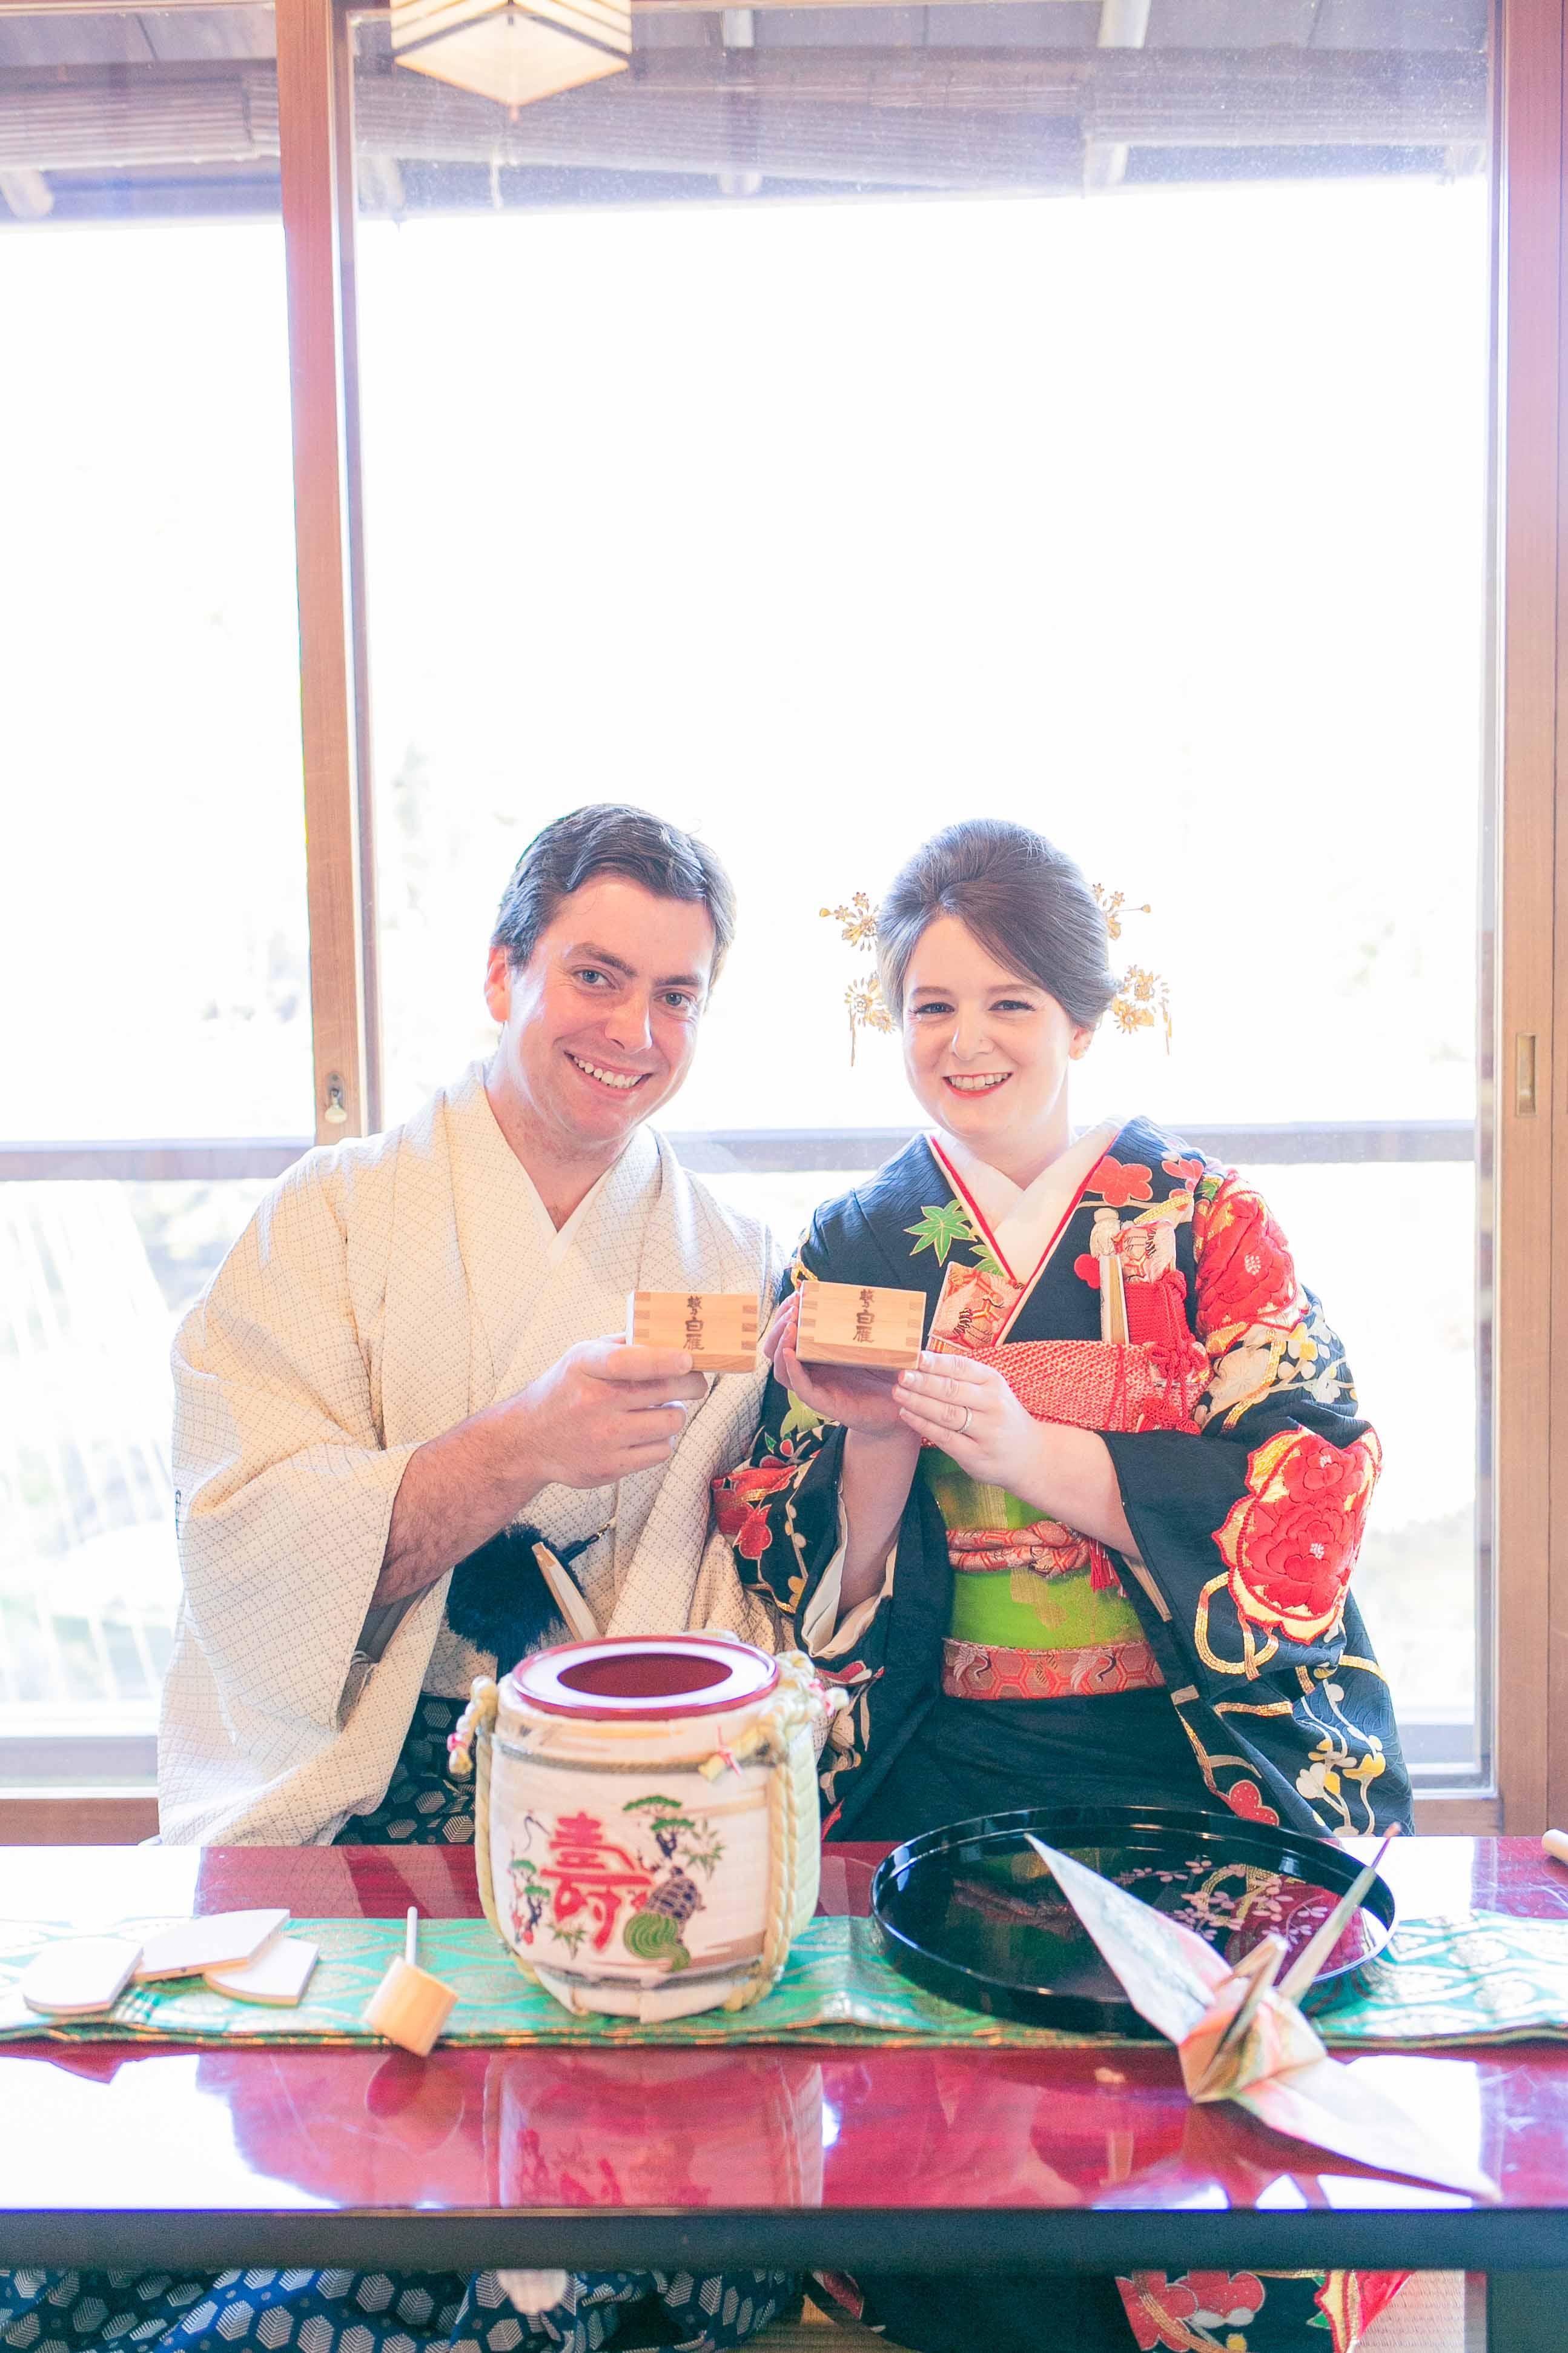 Garden Elopement - Drinking Sake